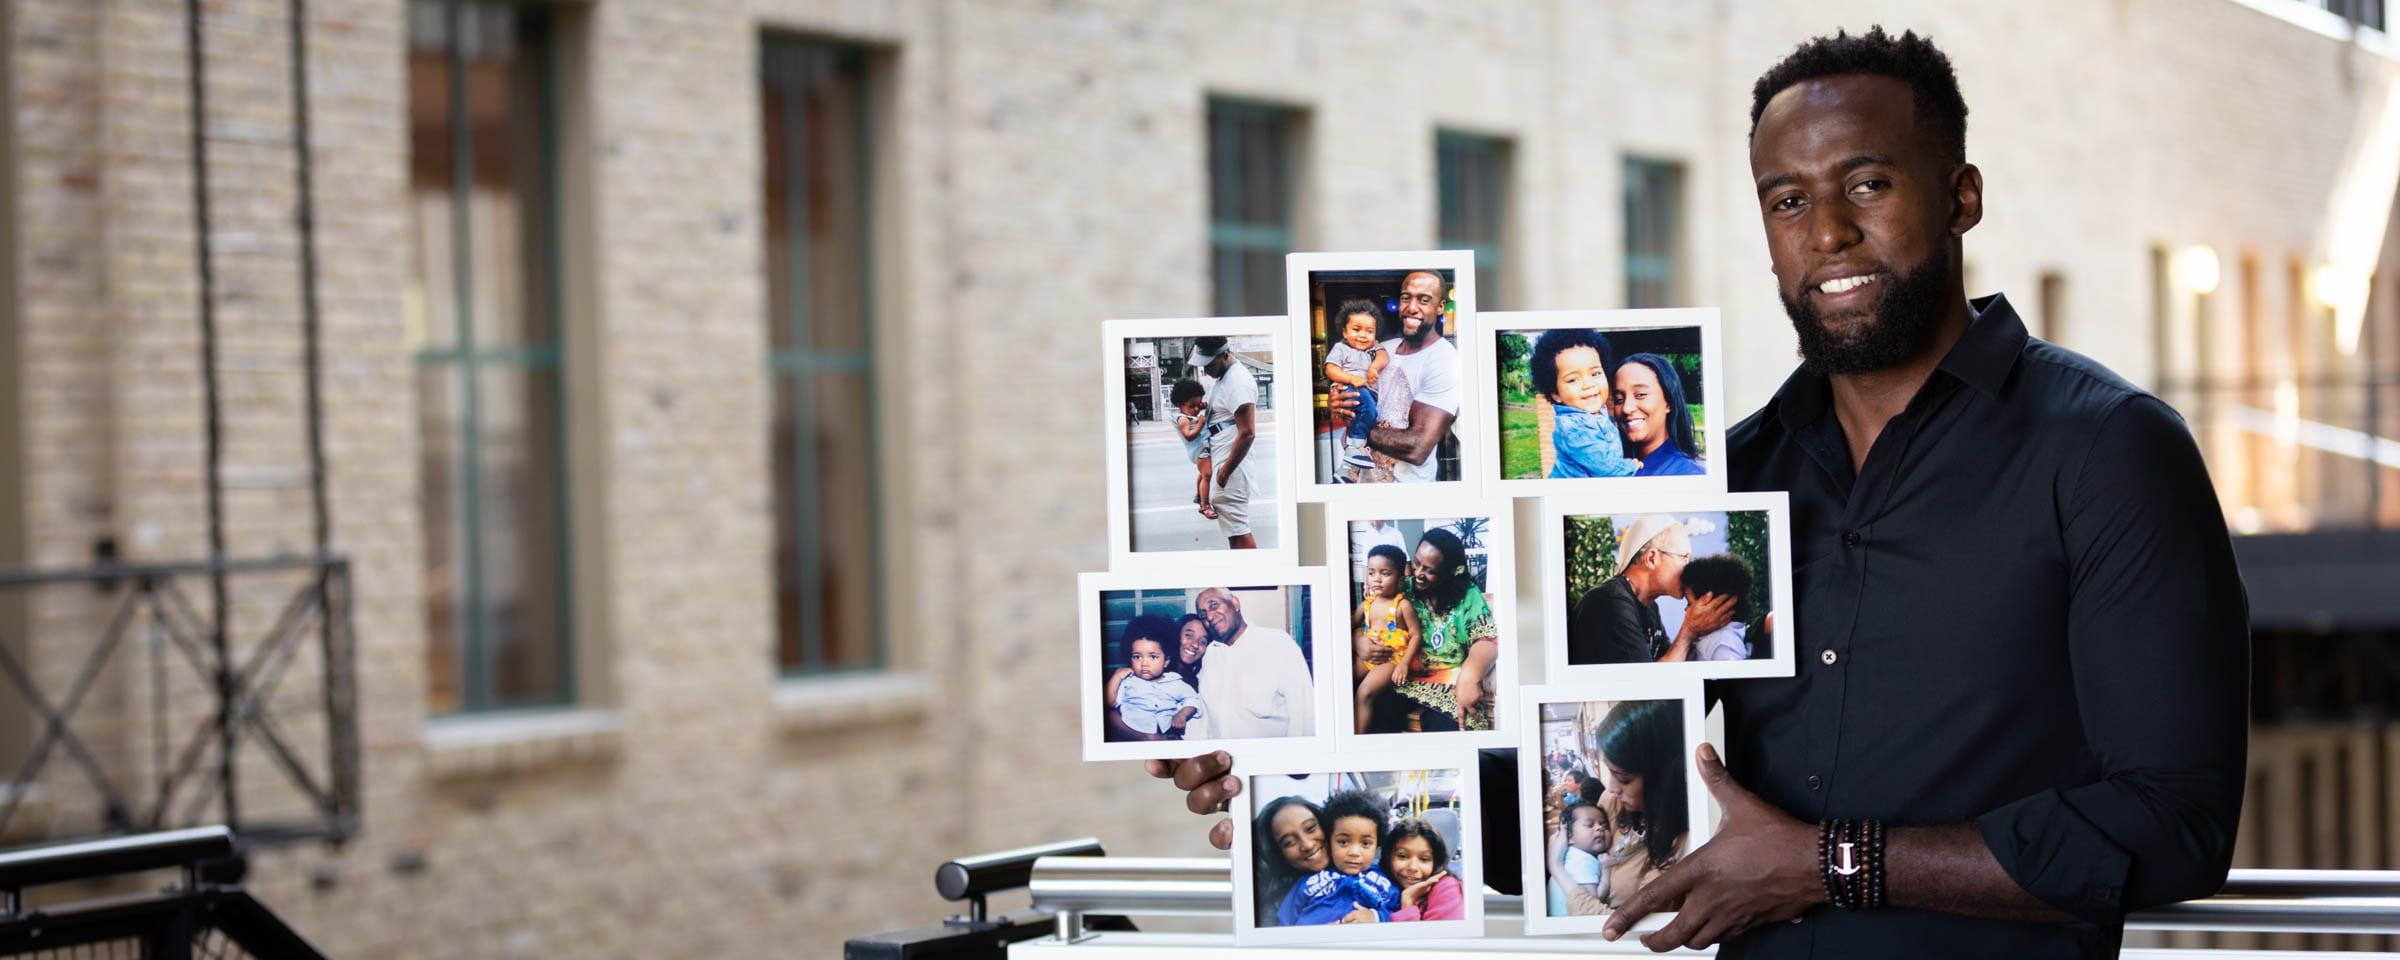 Flavio Raphael with photos of nephew Yuri César